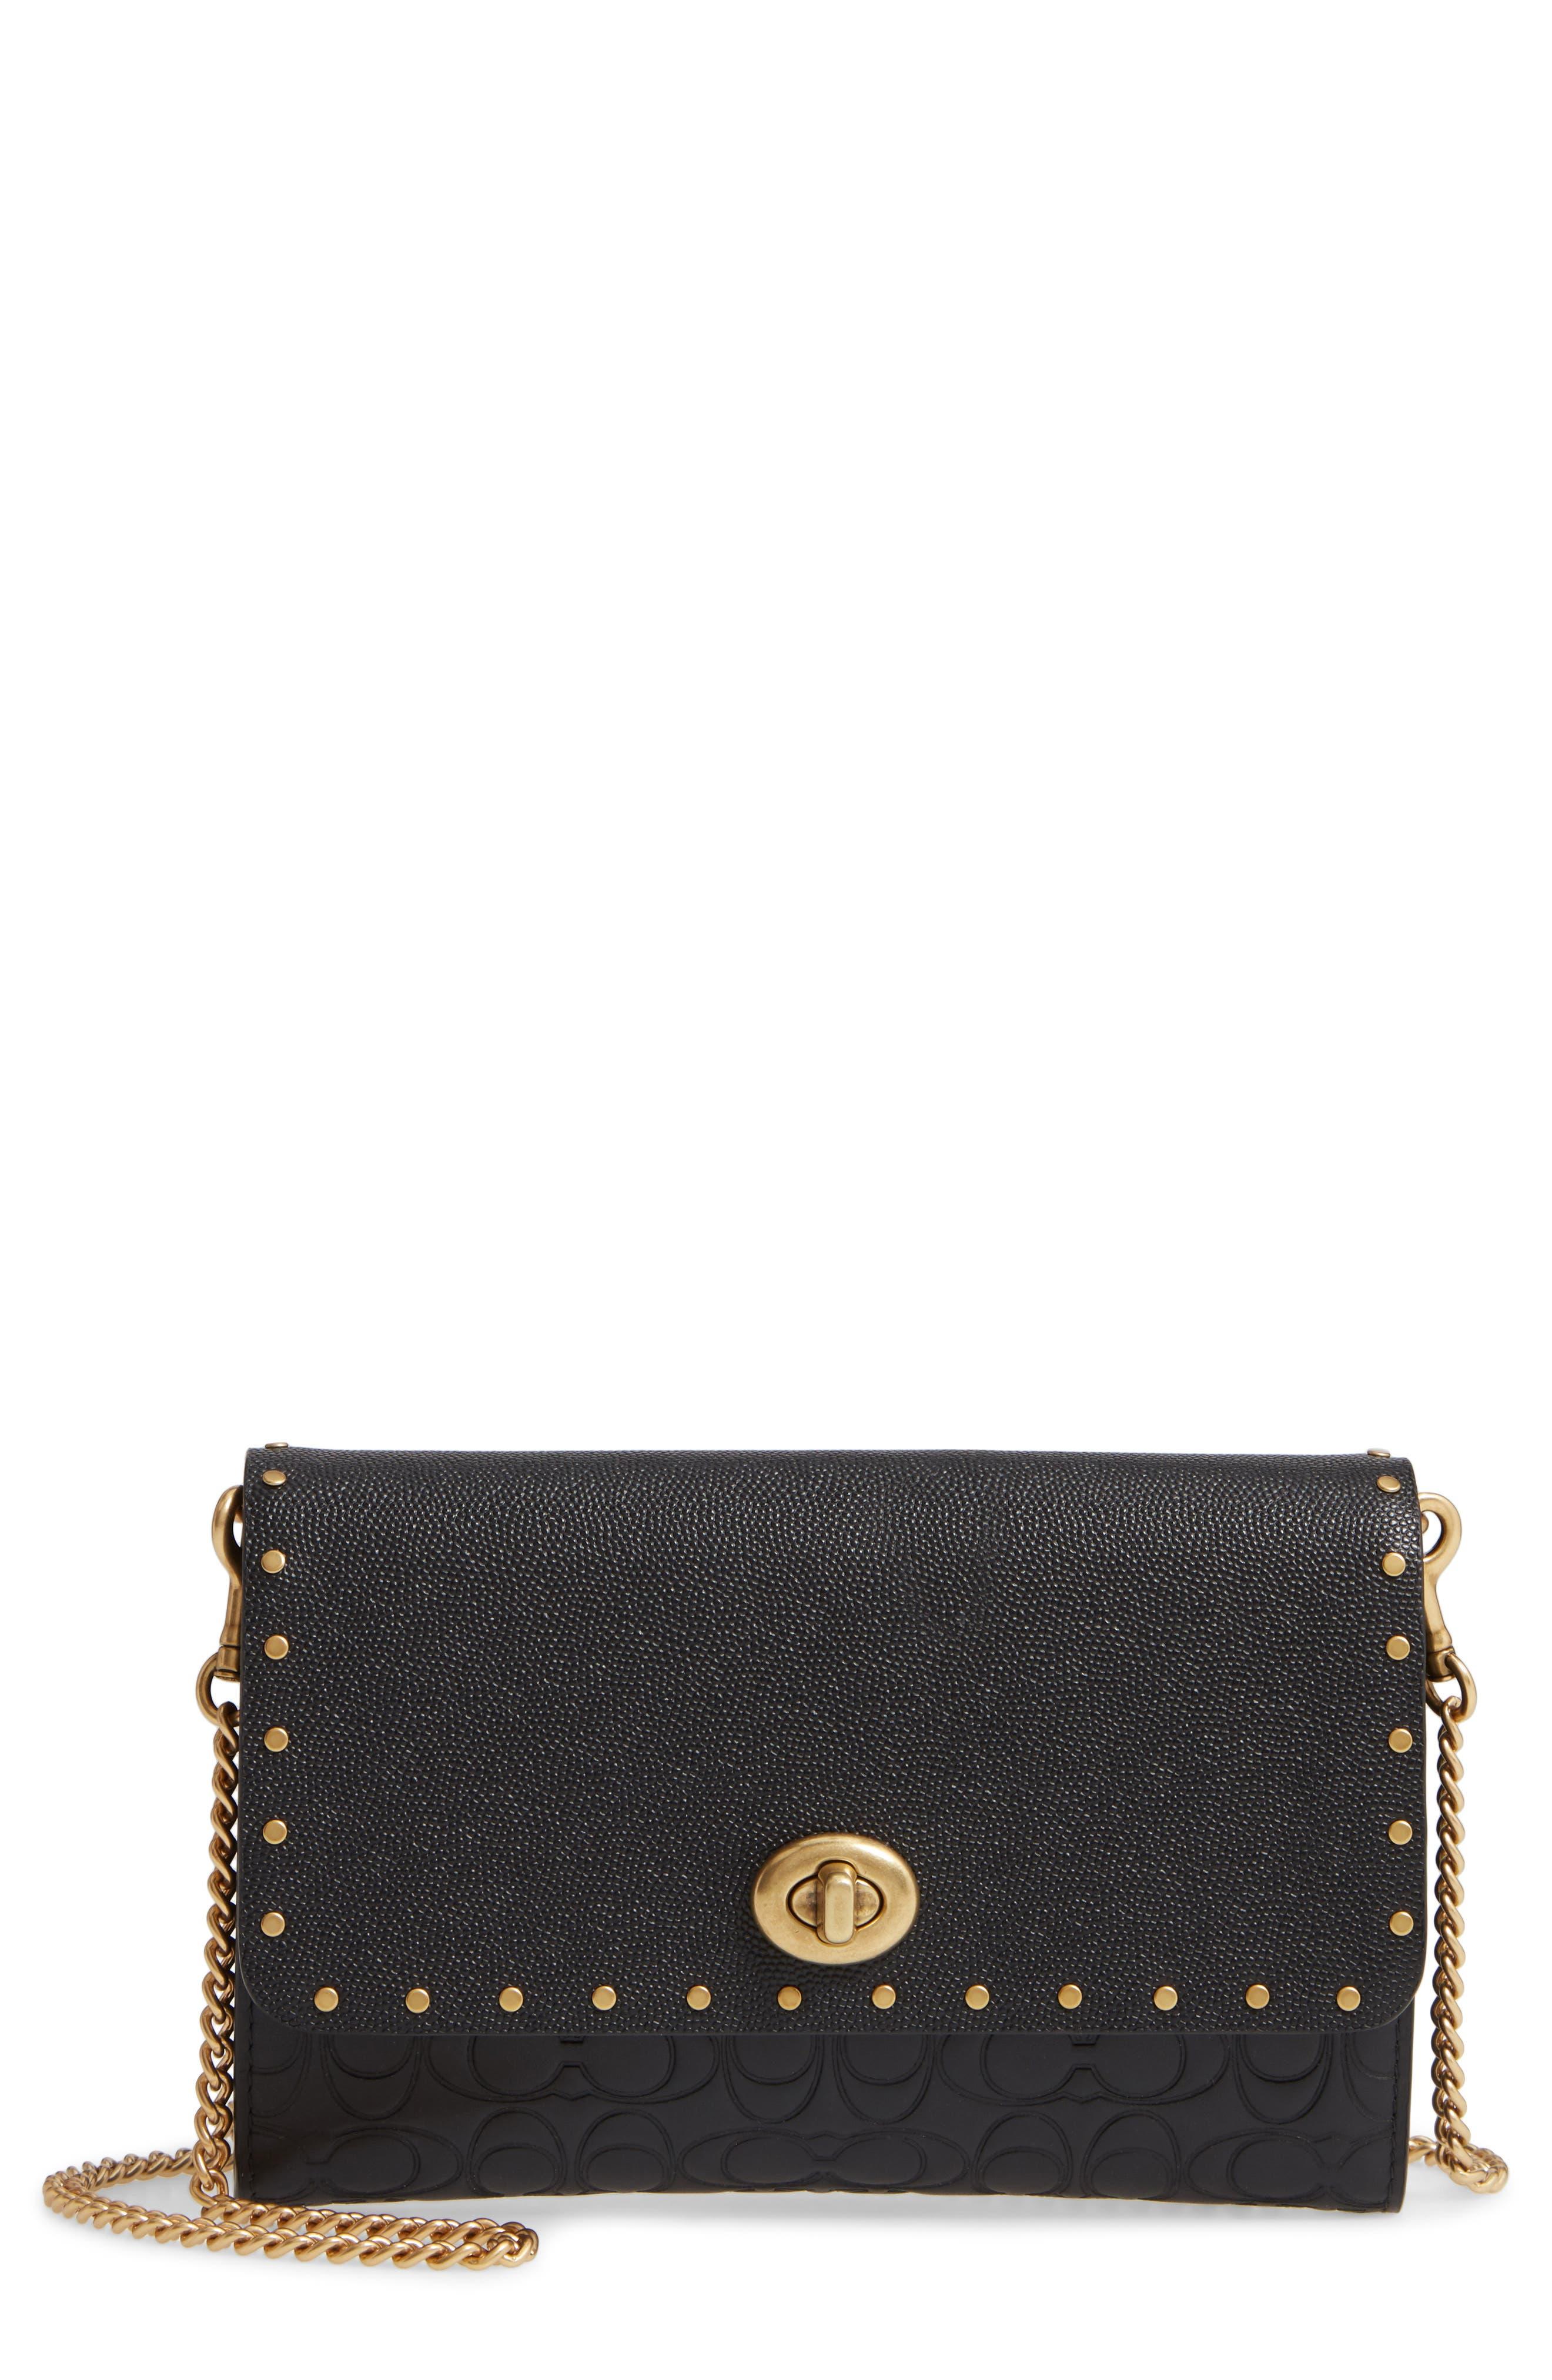 COACH Marlow Rivets Leather Crossbody Bag, Main, color, BLACK